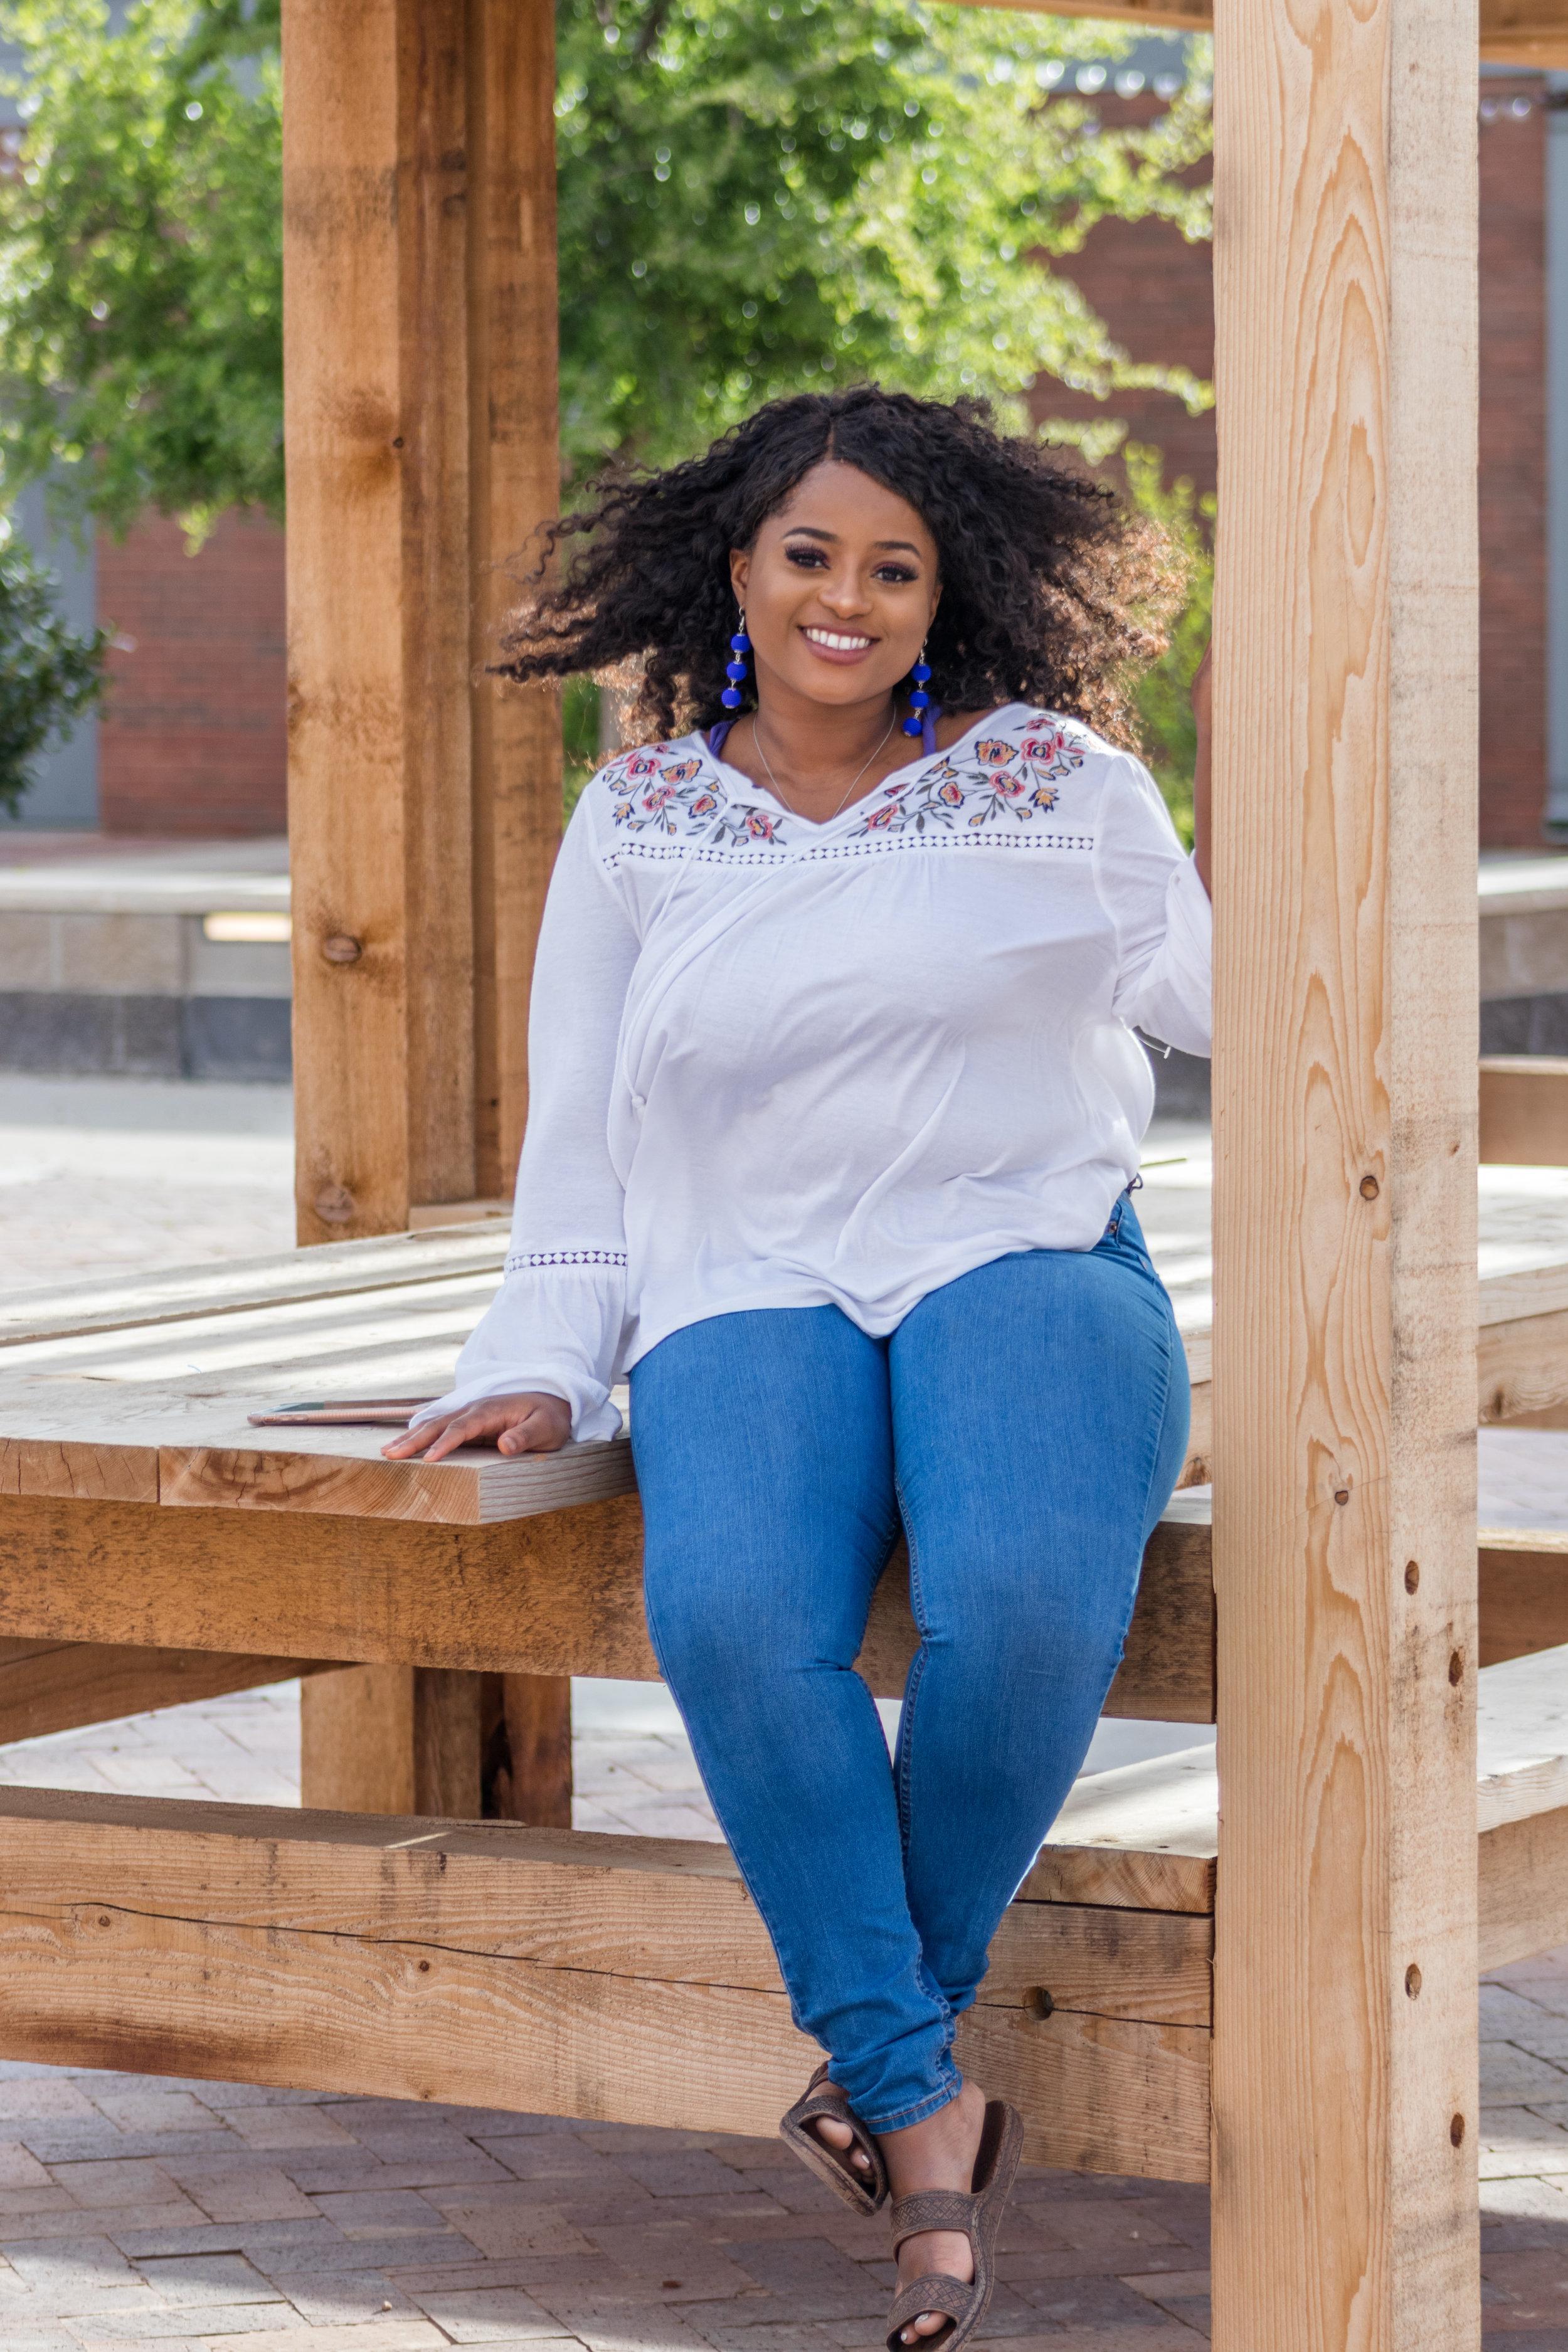 #41 Kellie *Adelida* Kadiri   Fall 2016 - Epsilon Line  Nationality: African-American  Major: Global Studies